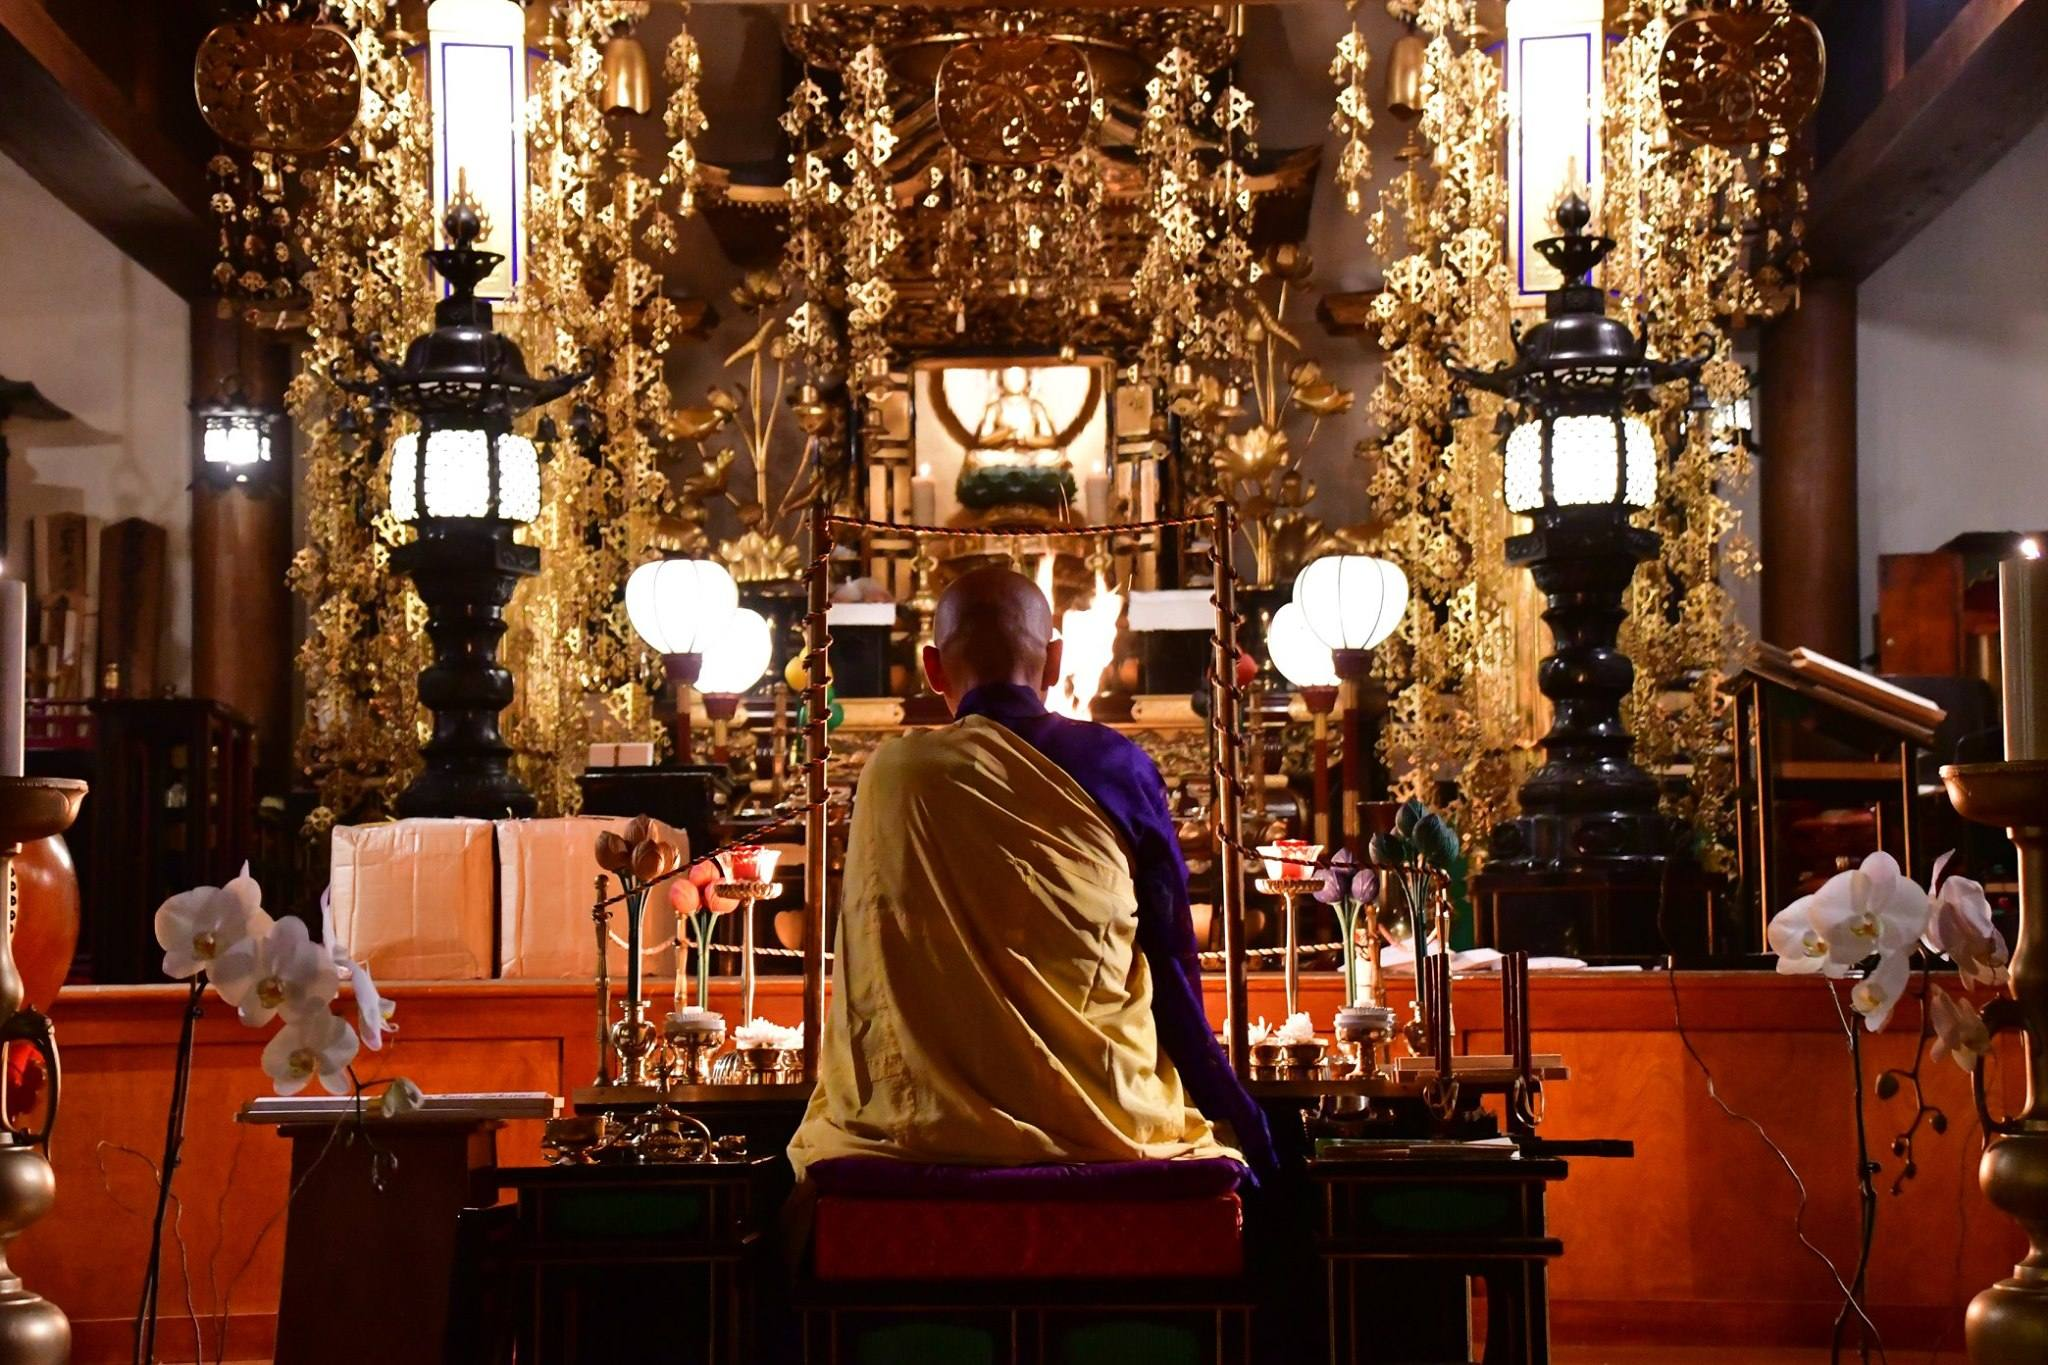 Monthly Goma Service at Los Angeles Koyasan Buddhist Temple